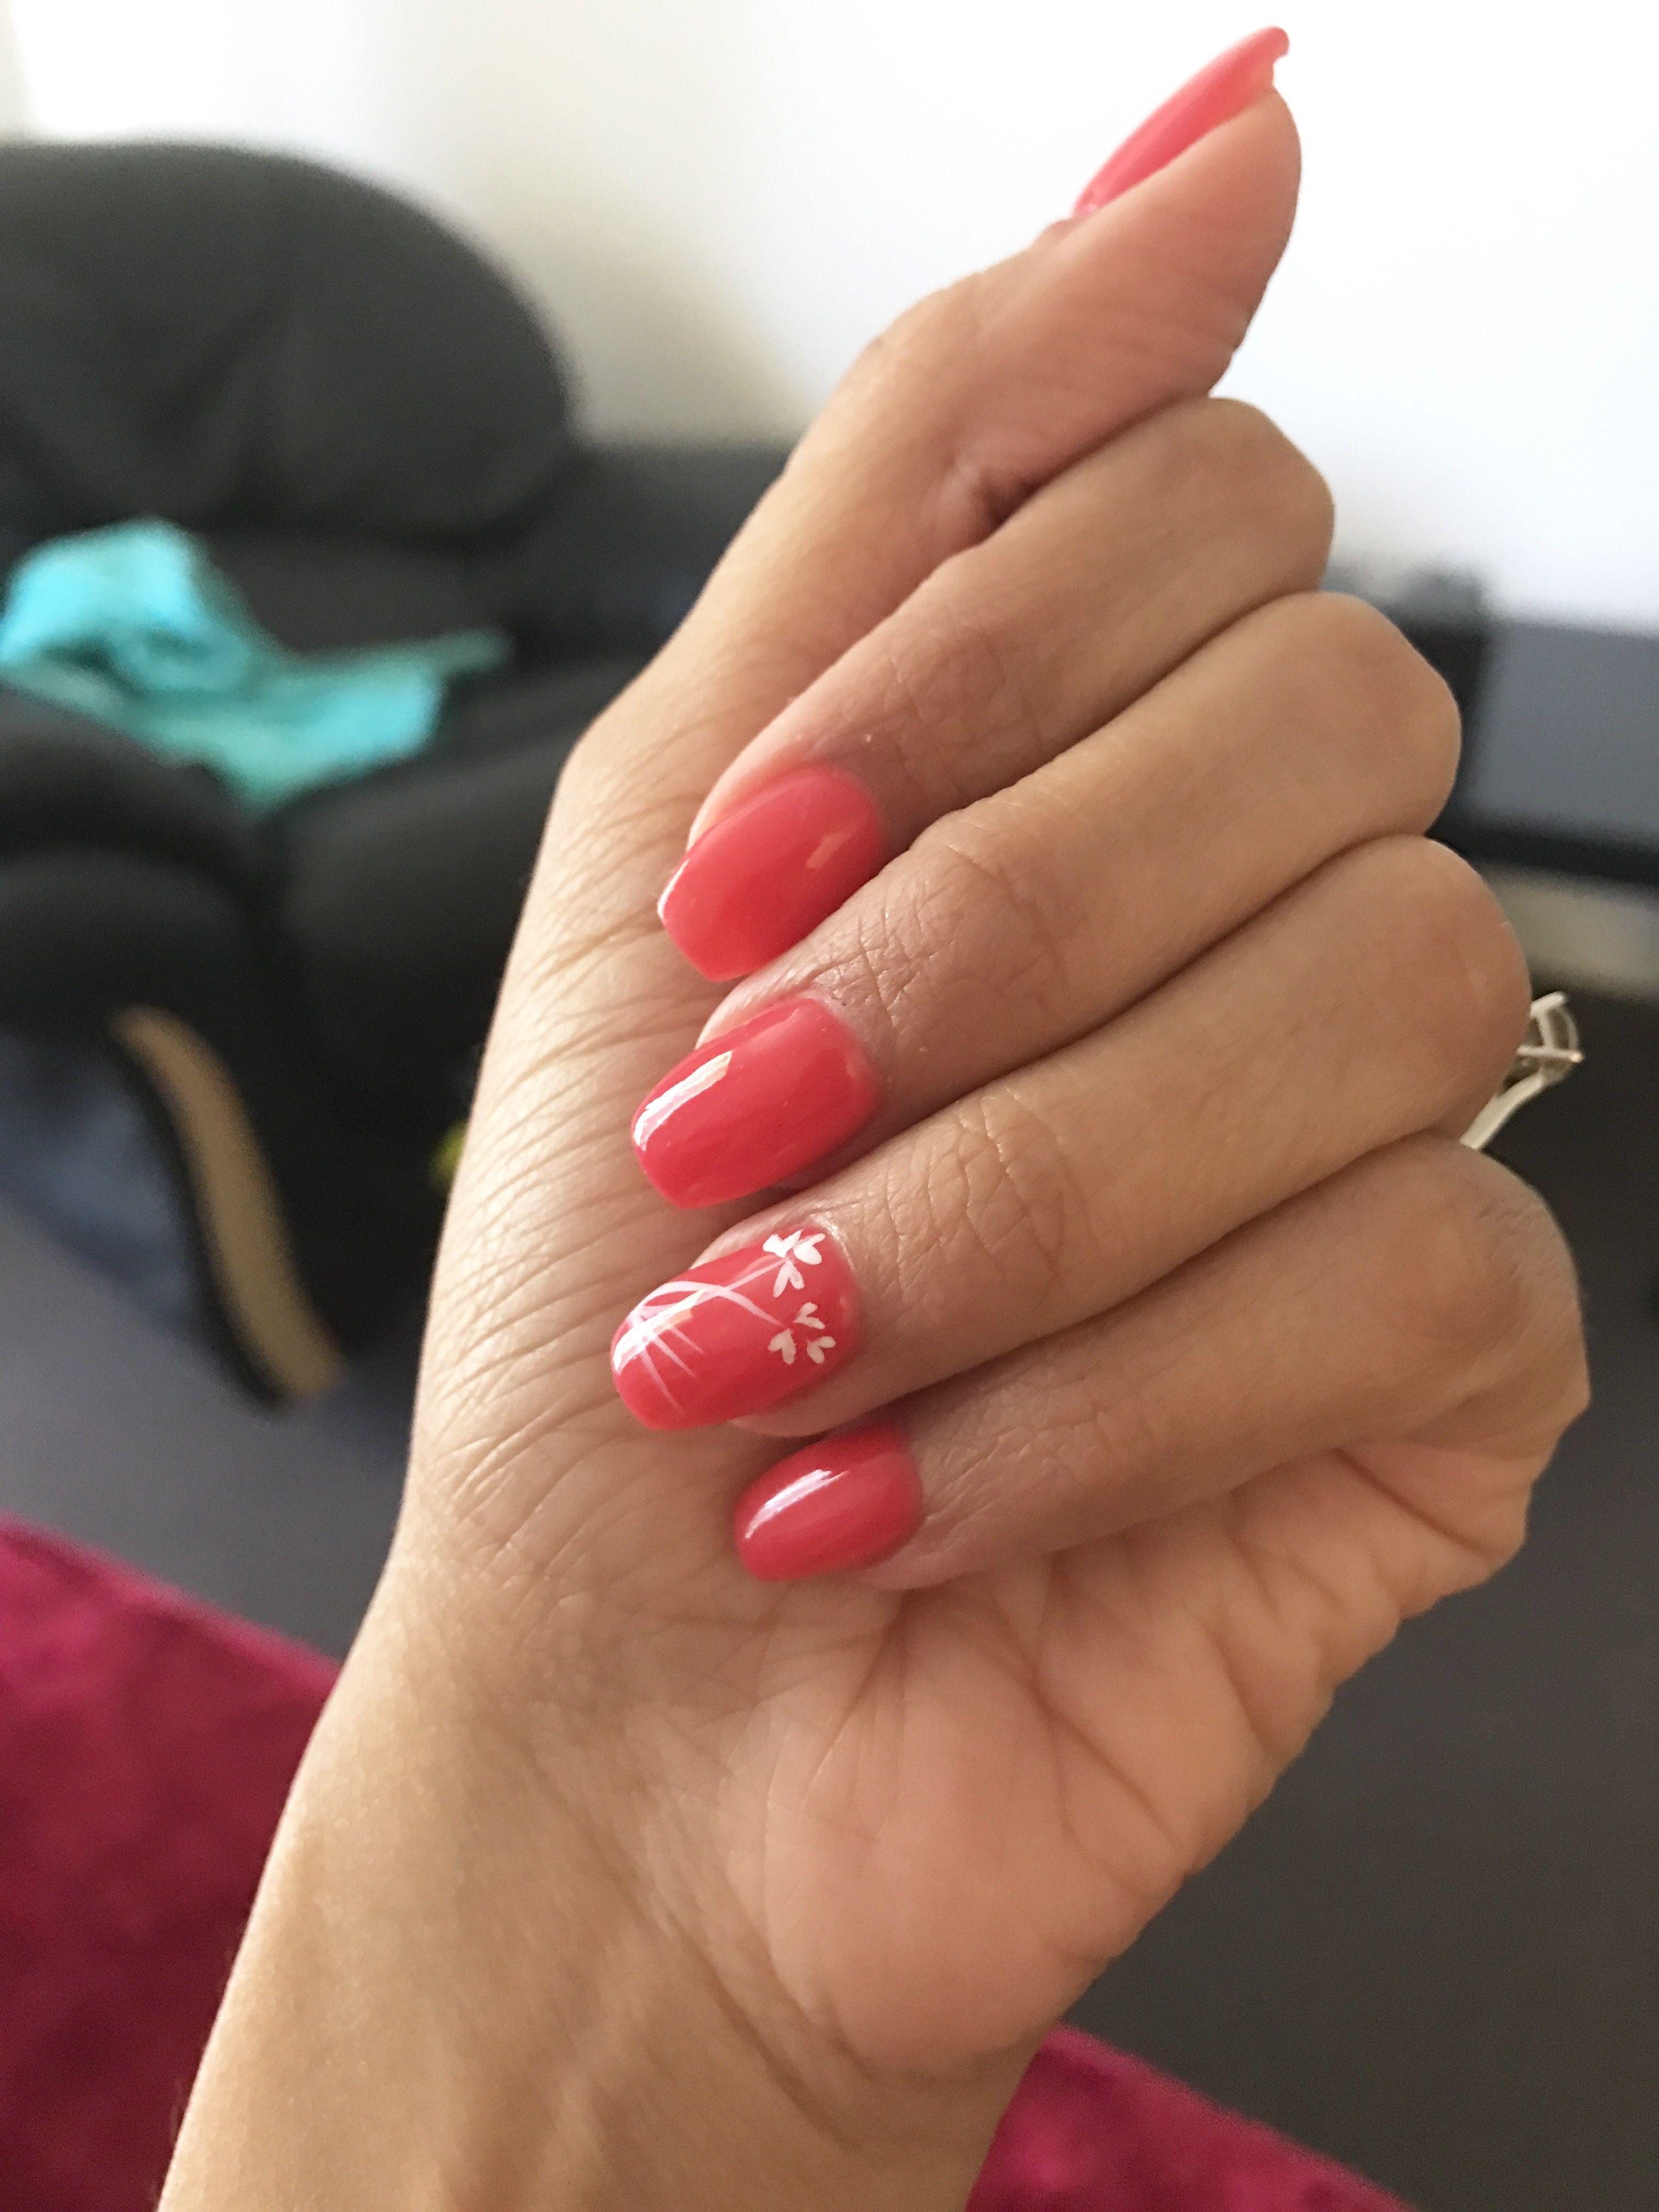 Lovely SNS nails  SNS nails  Pinterest  Sns nails and Nails